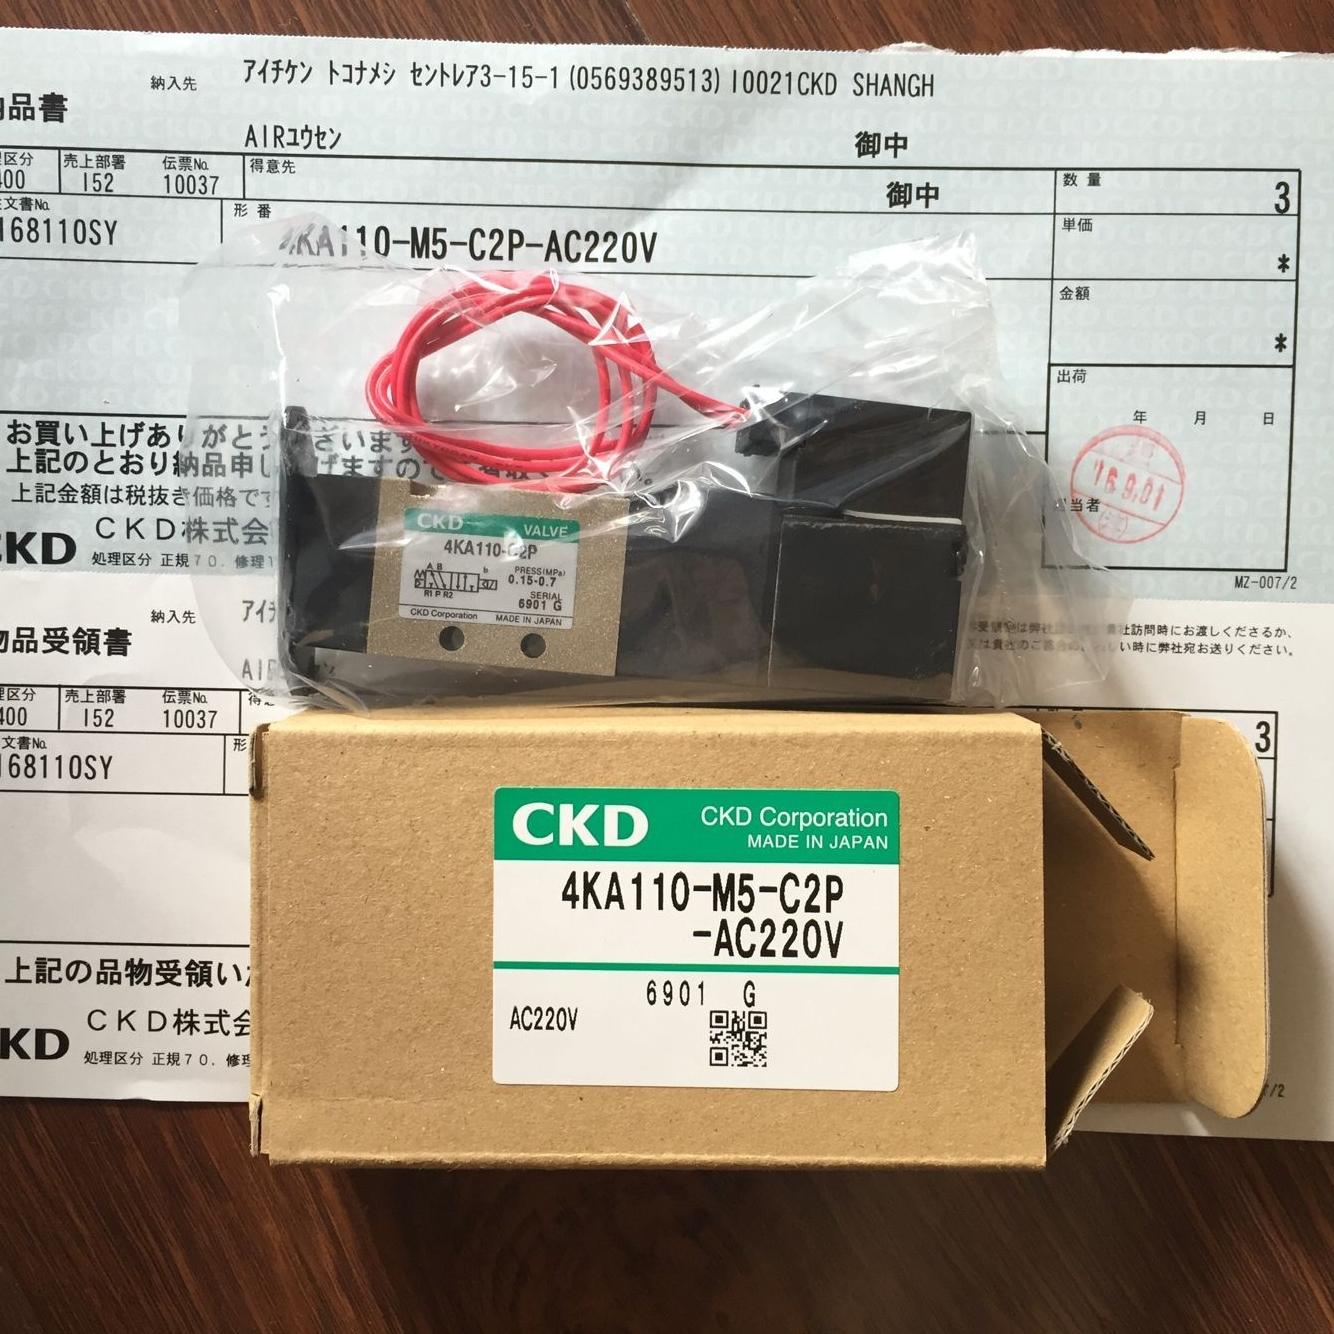 Van điện từ CKD 4KA110-M5-C2P-AC220V